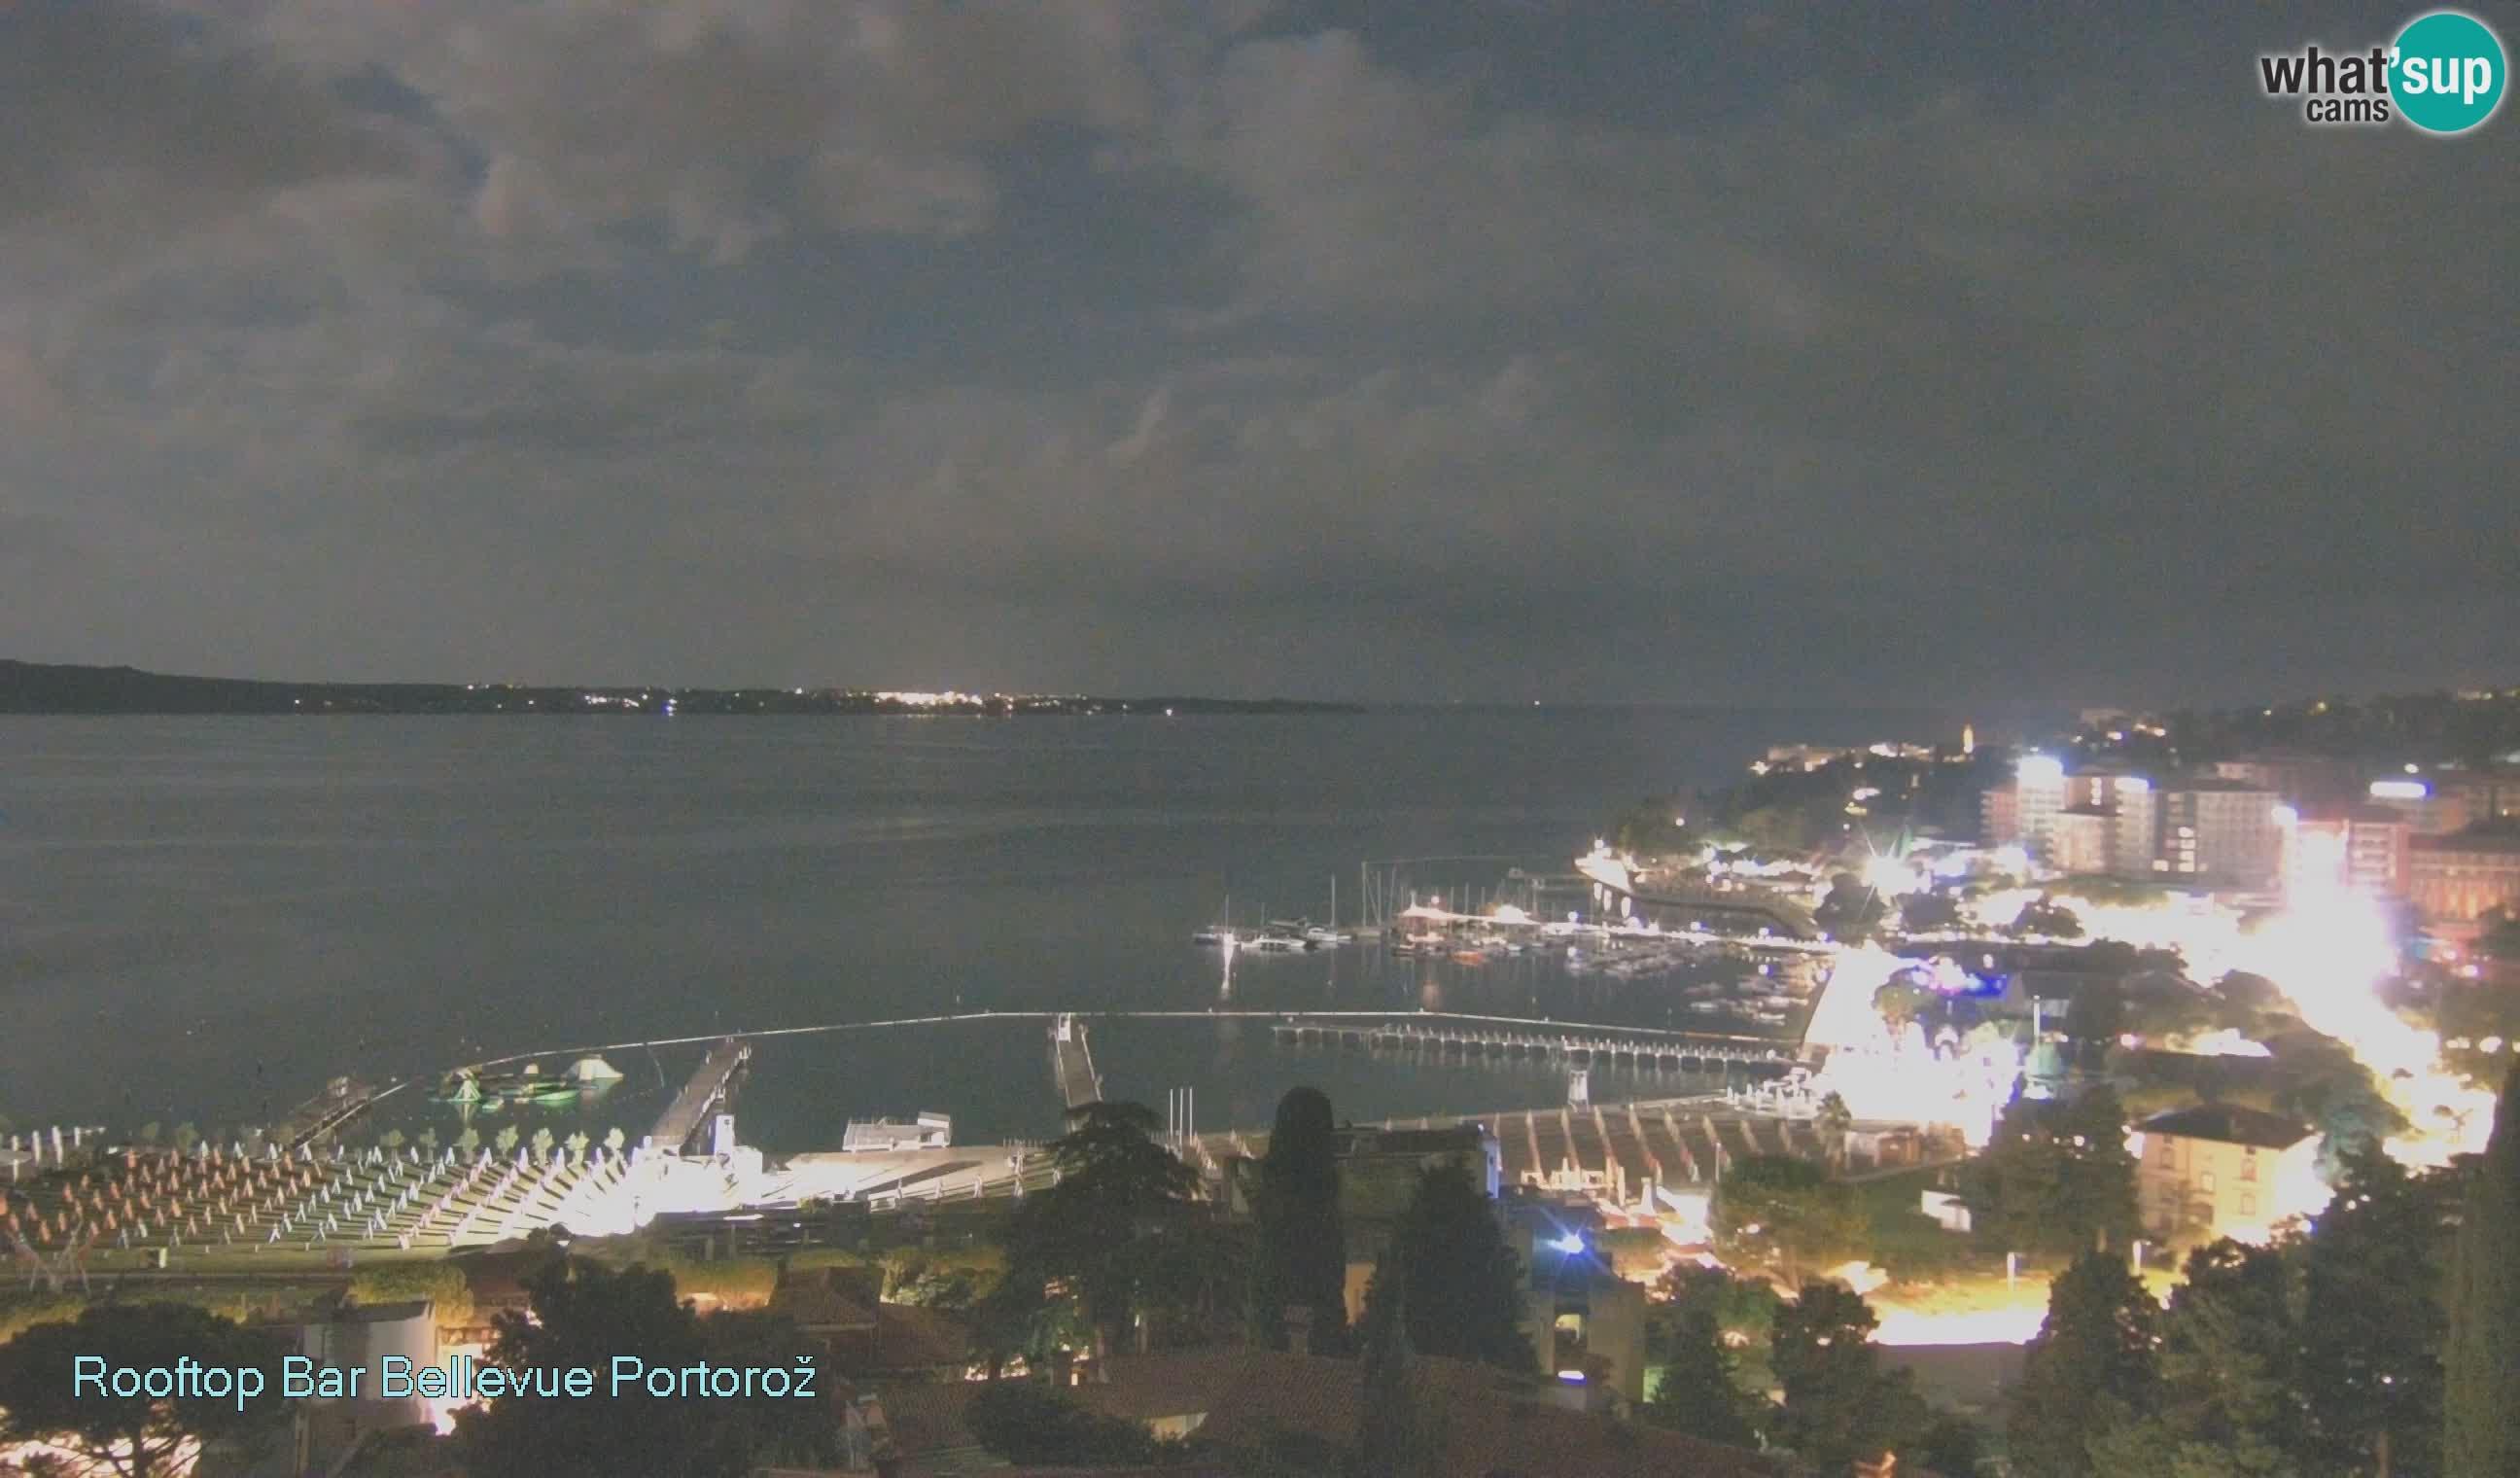 Portorož web kamera – pogled sa Villa Bellevue